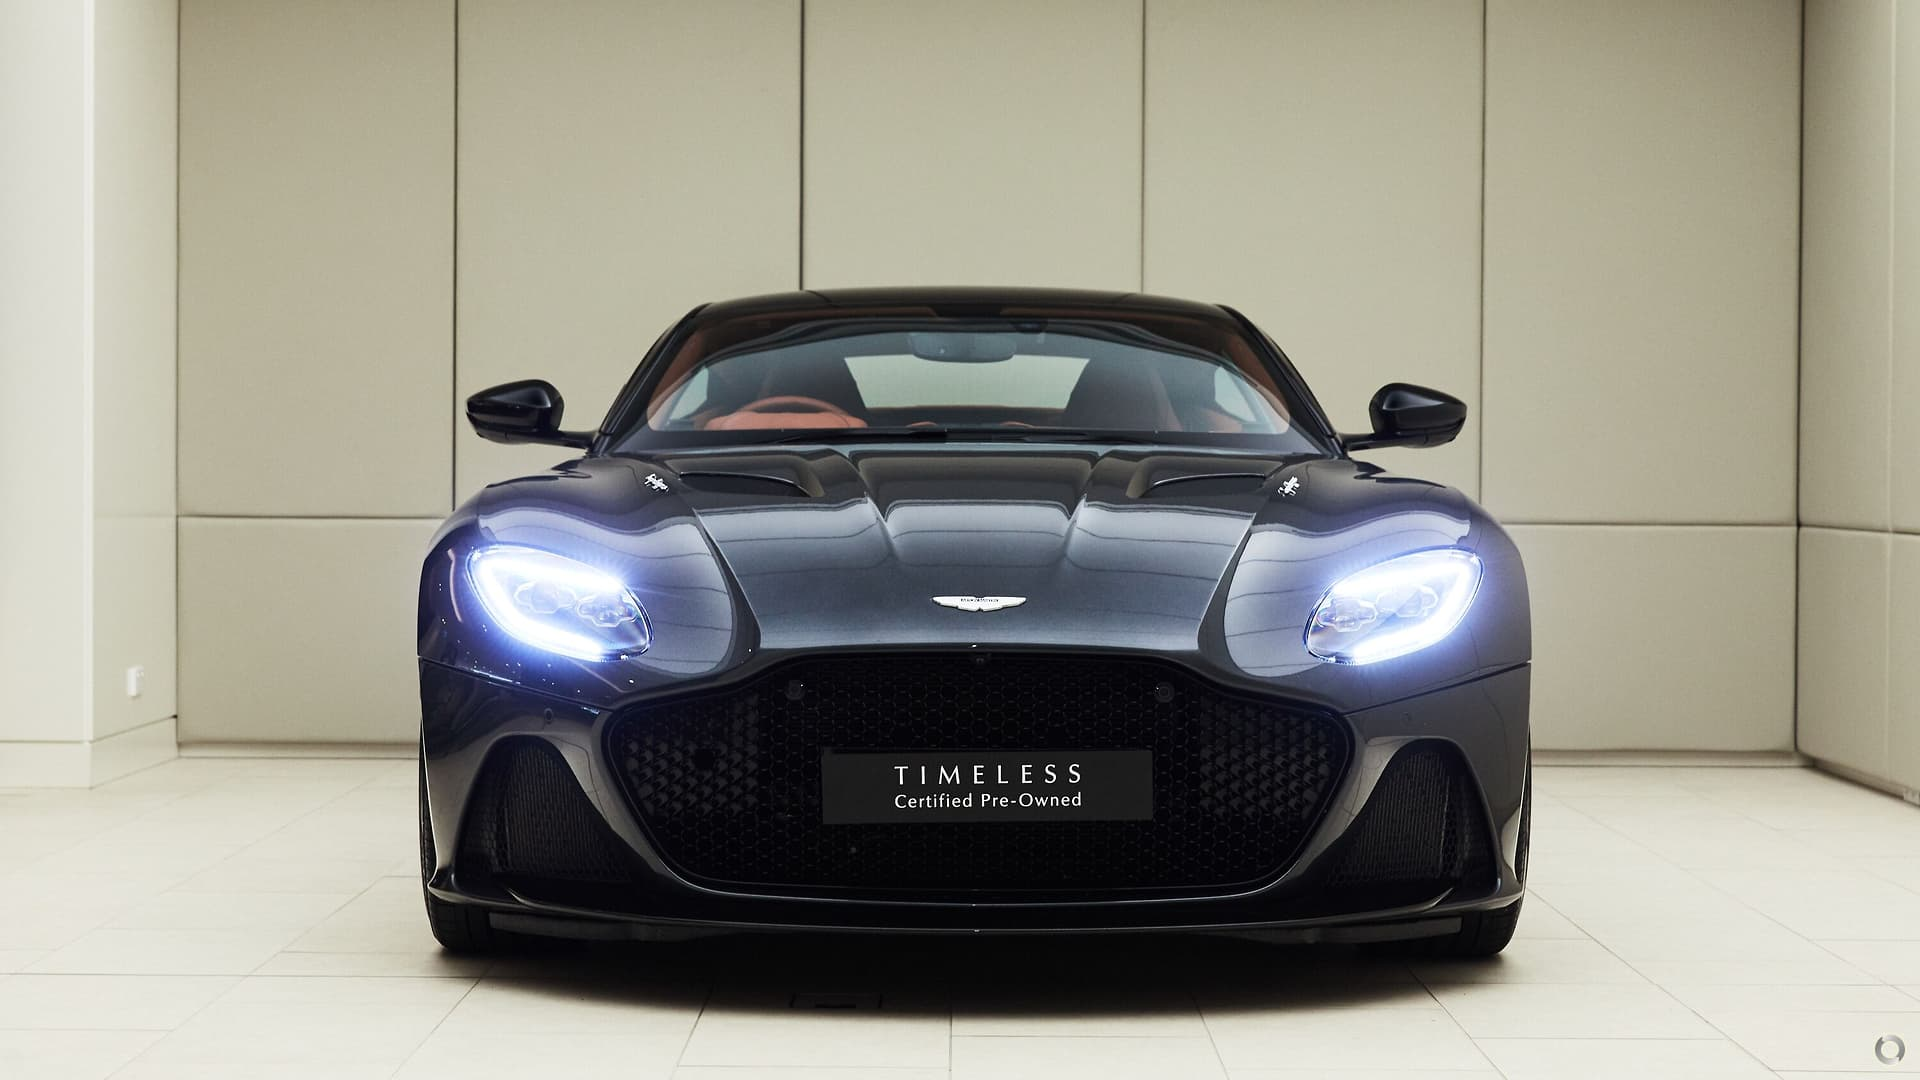 2018 Aston Martin DBS Superleggera (No Series)